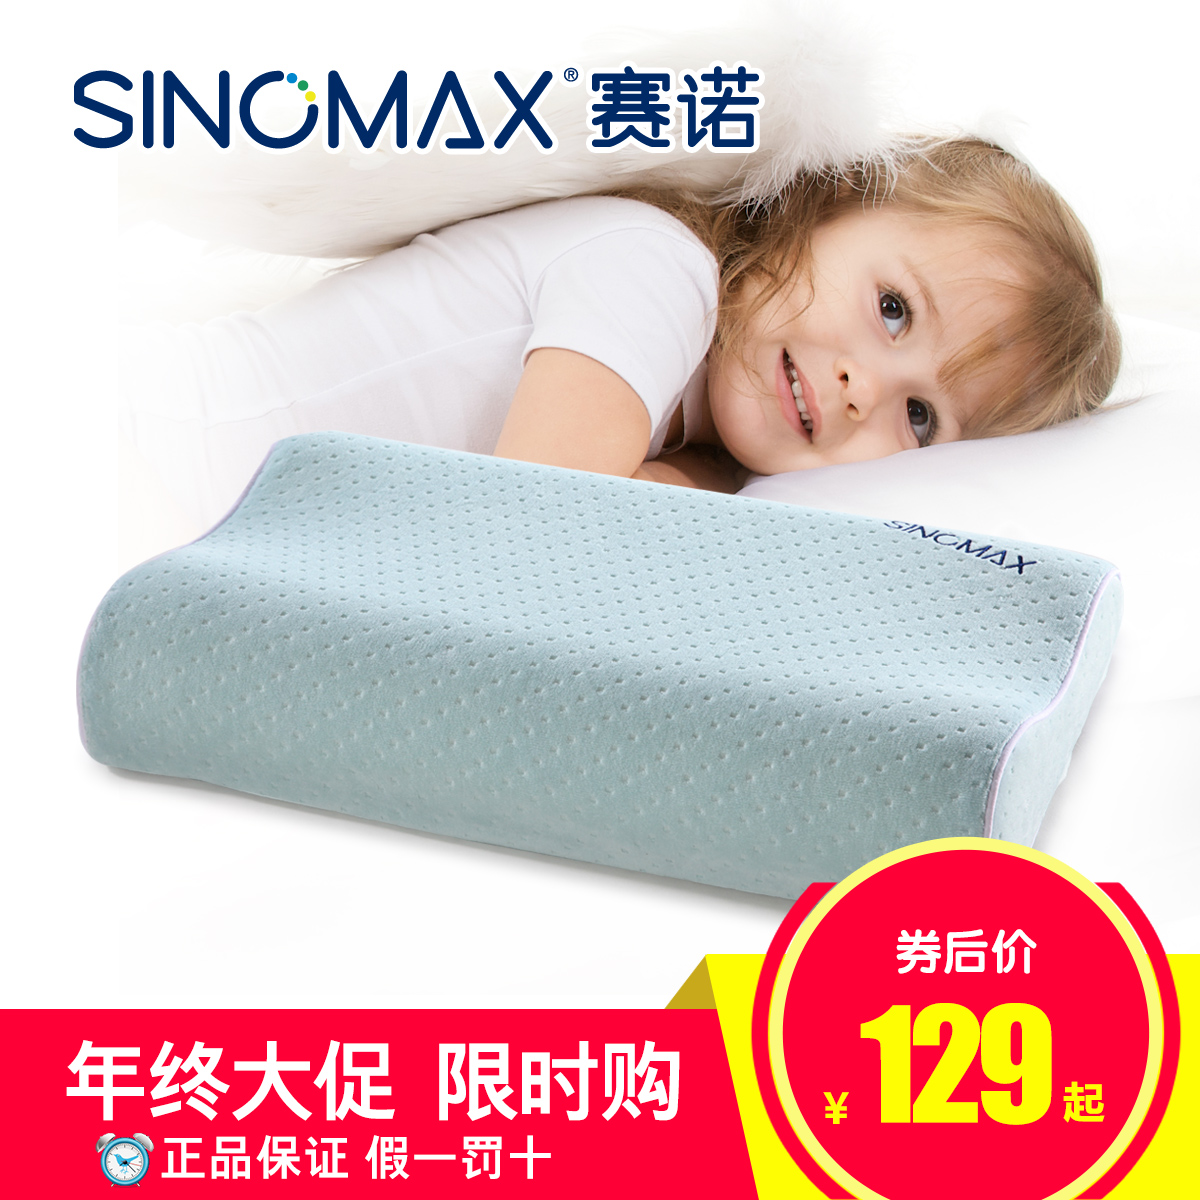 Детская подушка Sinomax app057, /057 3-6-10